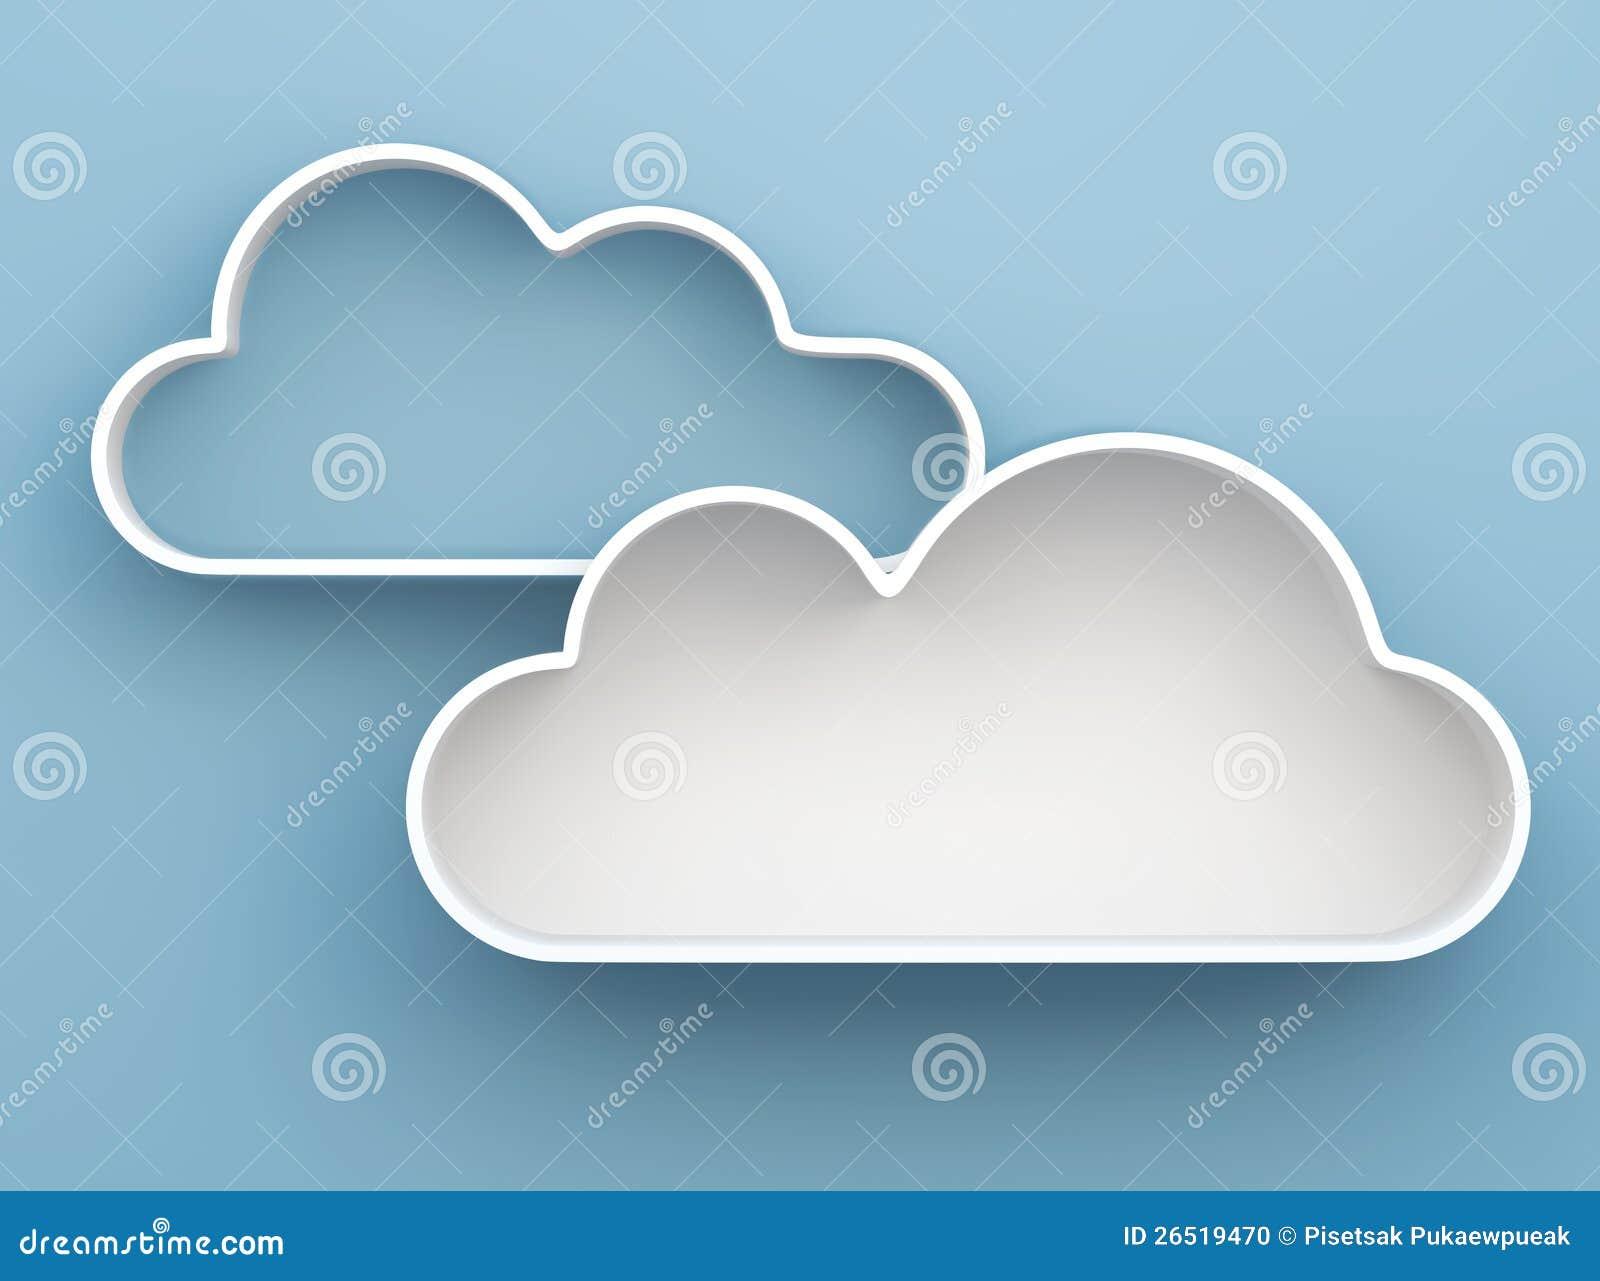 3d Cloud Shelves And Shelf Design Stock Photo Image